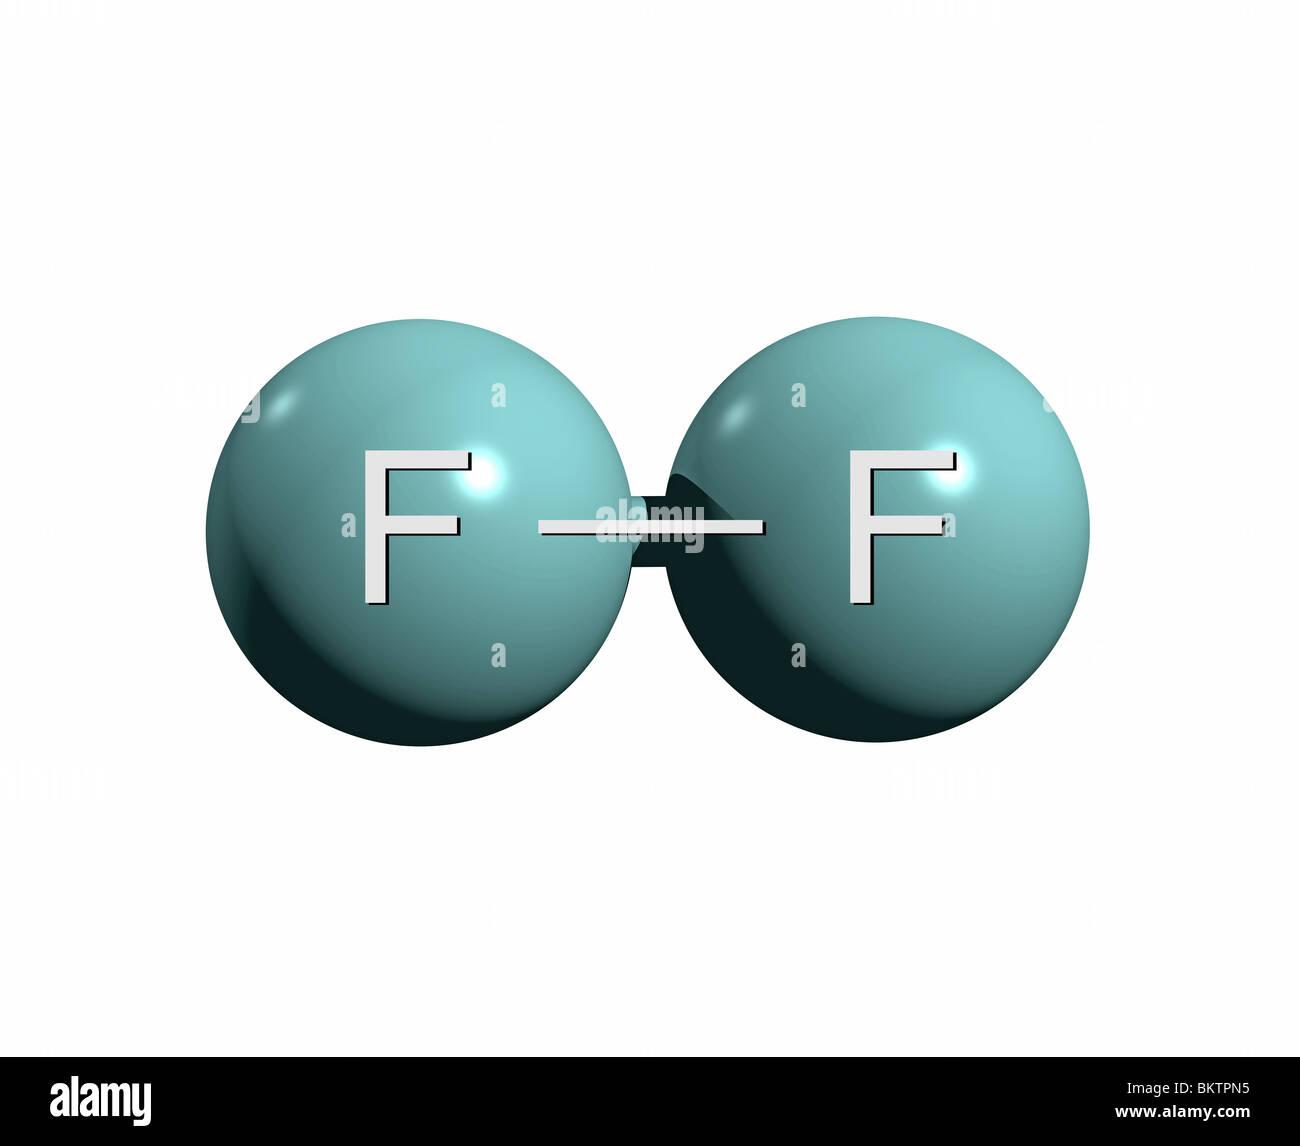 fluormolek�l f2 / fluorine molecule f2 - stock image